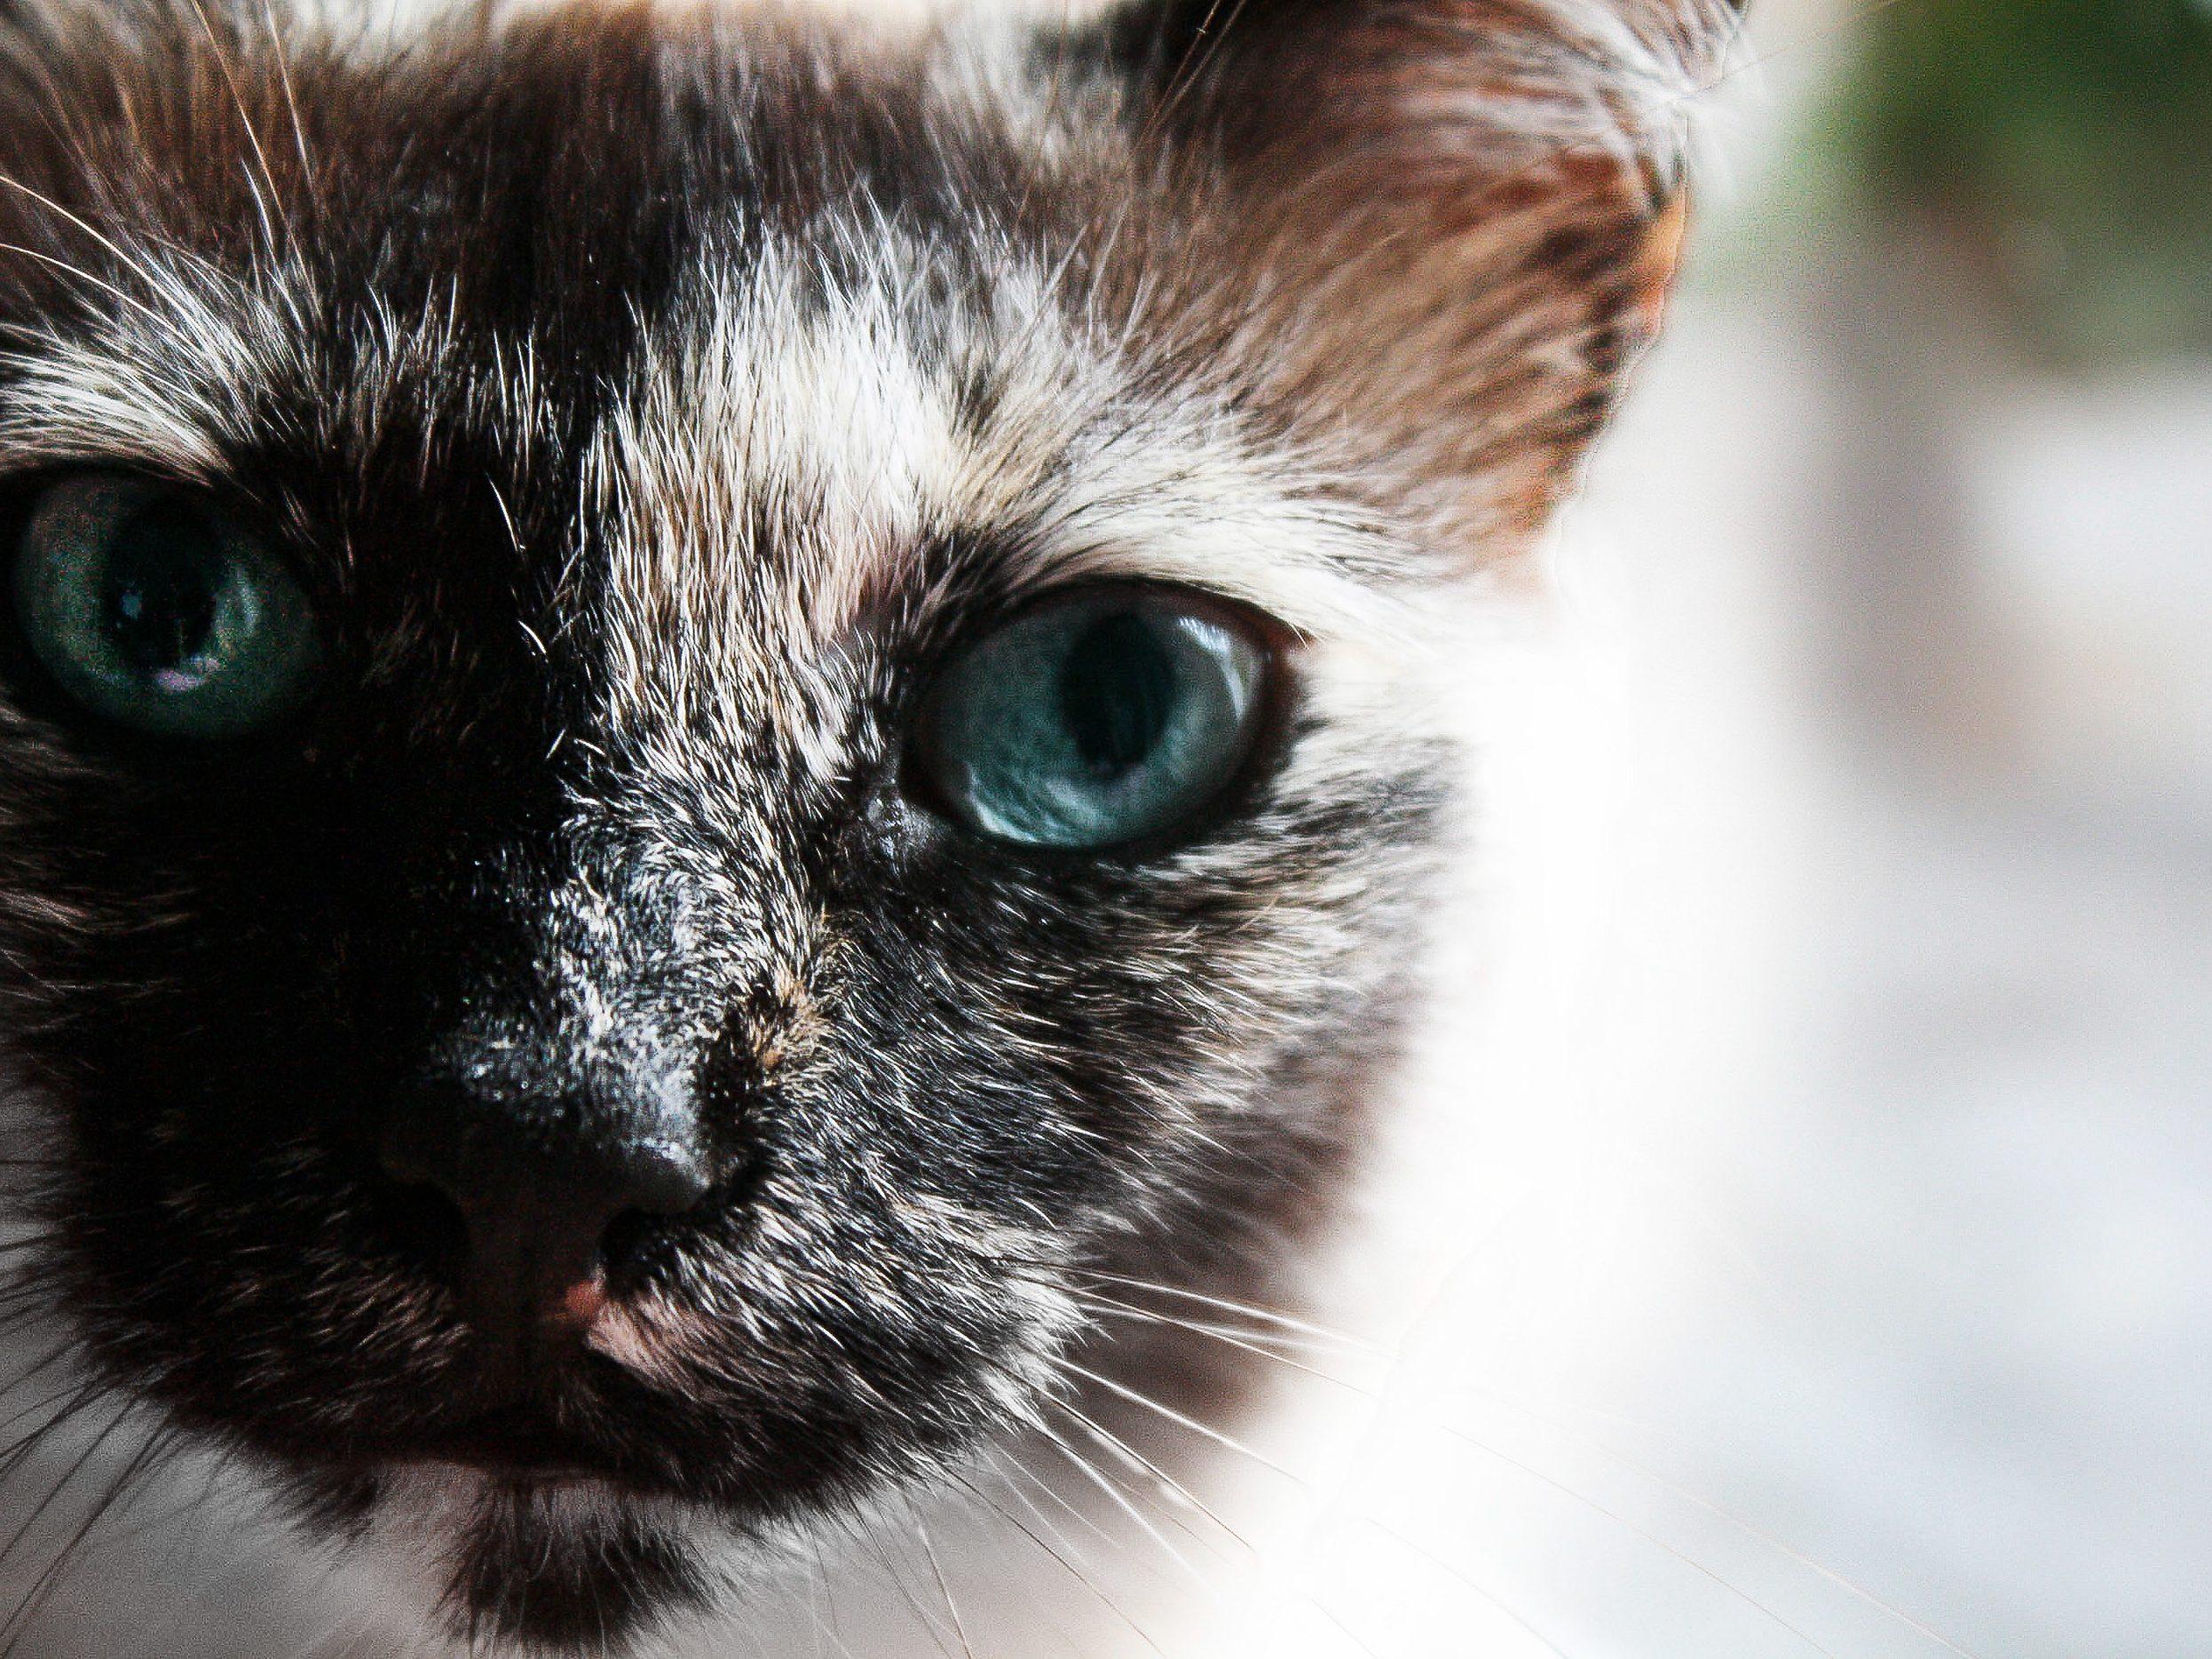 Cat close up photography